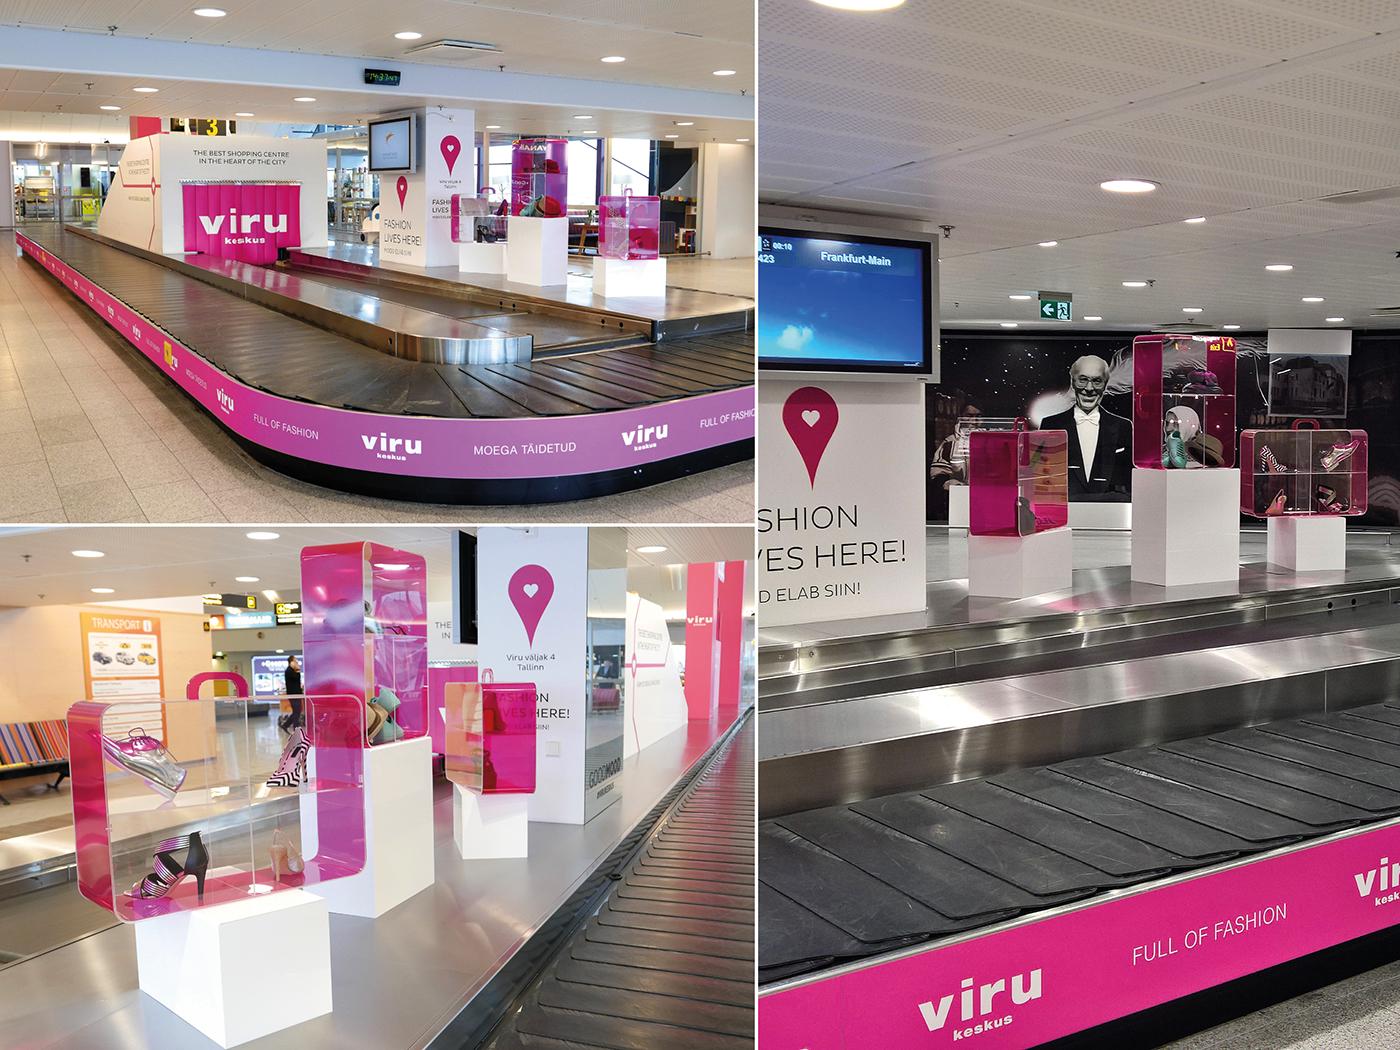 Ambient Fashion  airport plexiglass ambient advertising fashion advertising high-fashion Airport Advertising